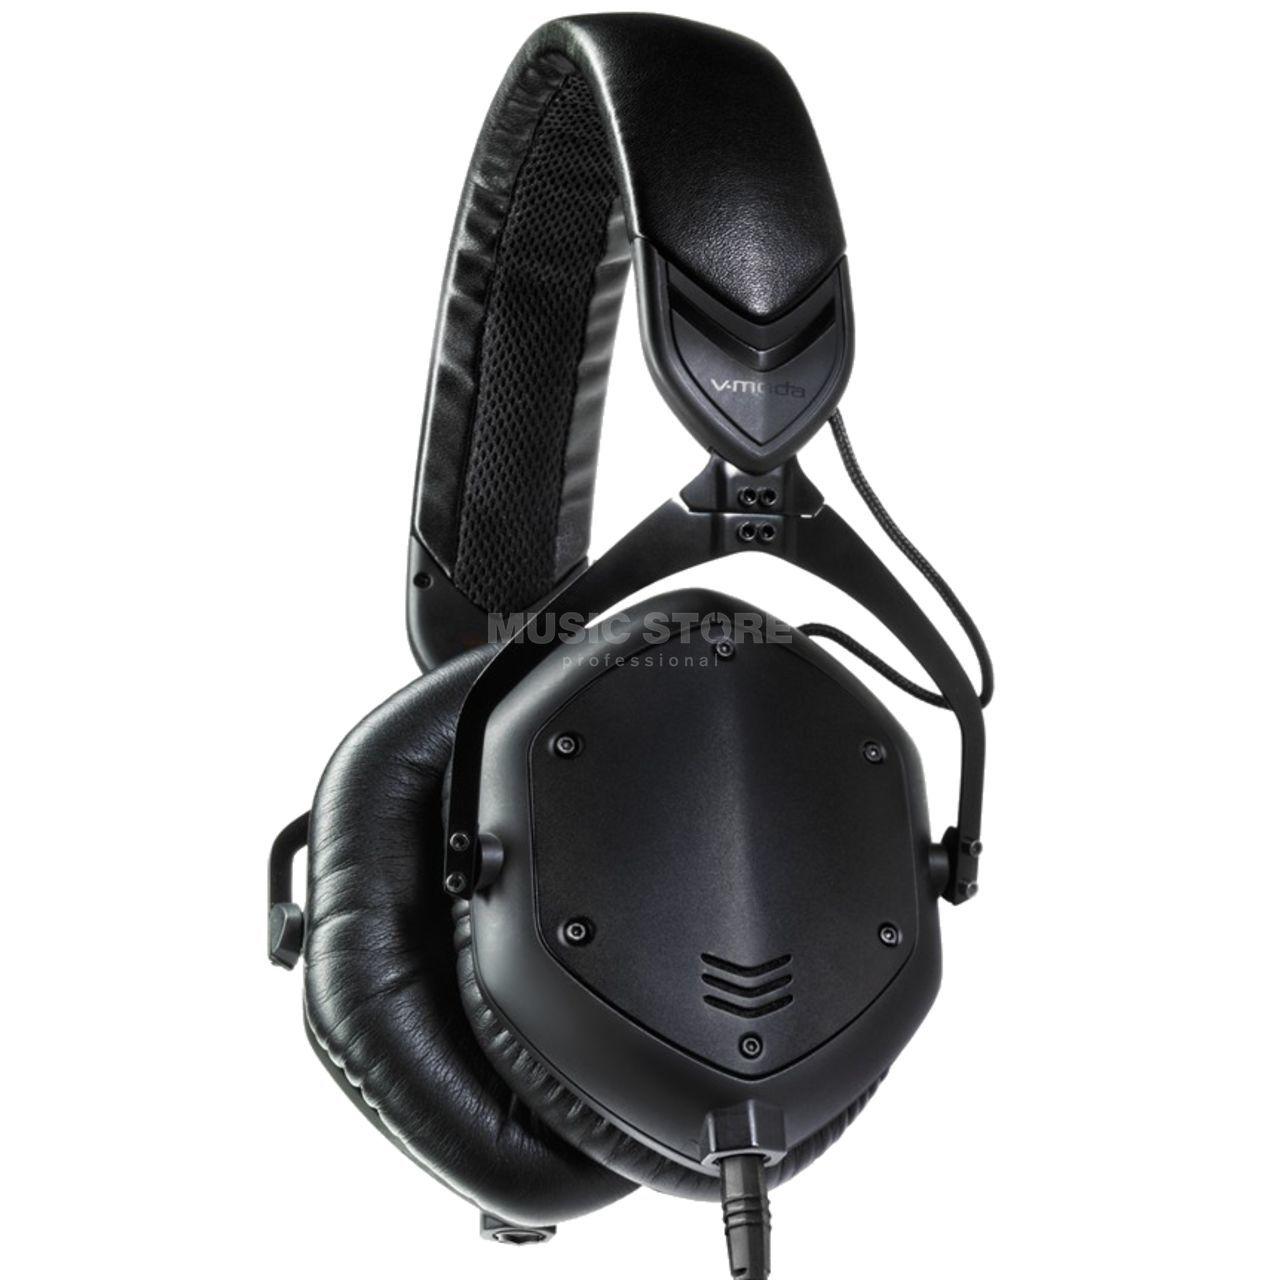 V-Moda Crossfade M-100 Headphones, matte black | MUSIC STORE professional |  en-OE